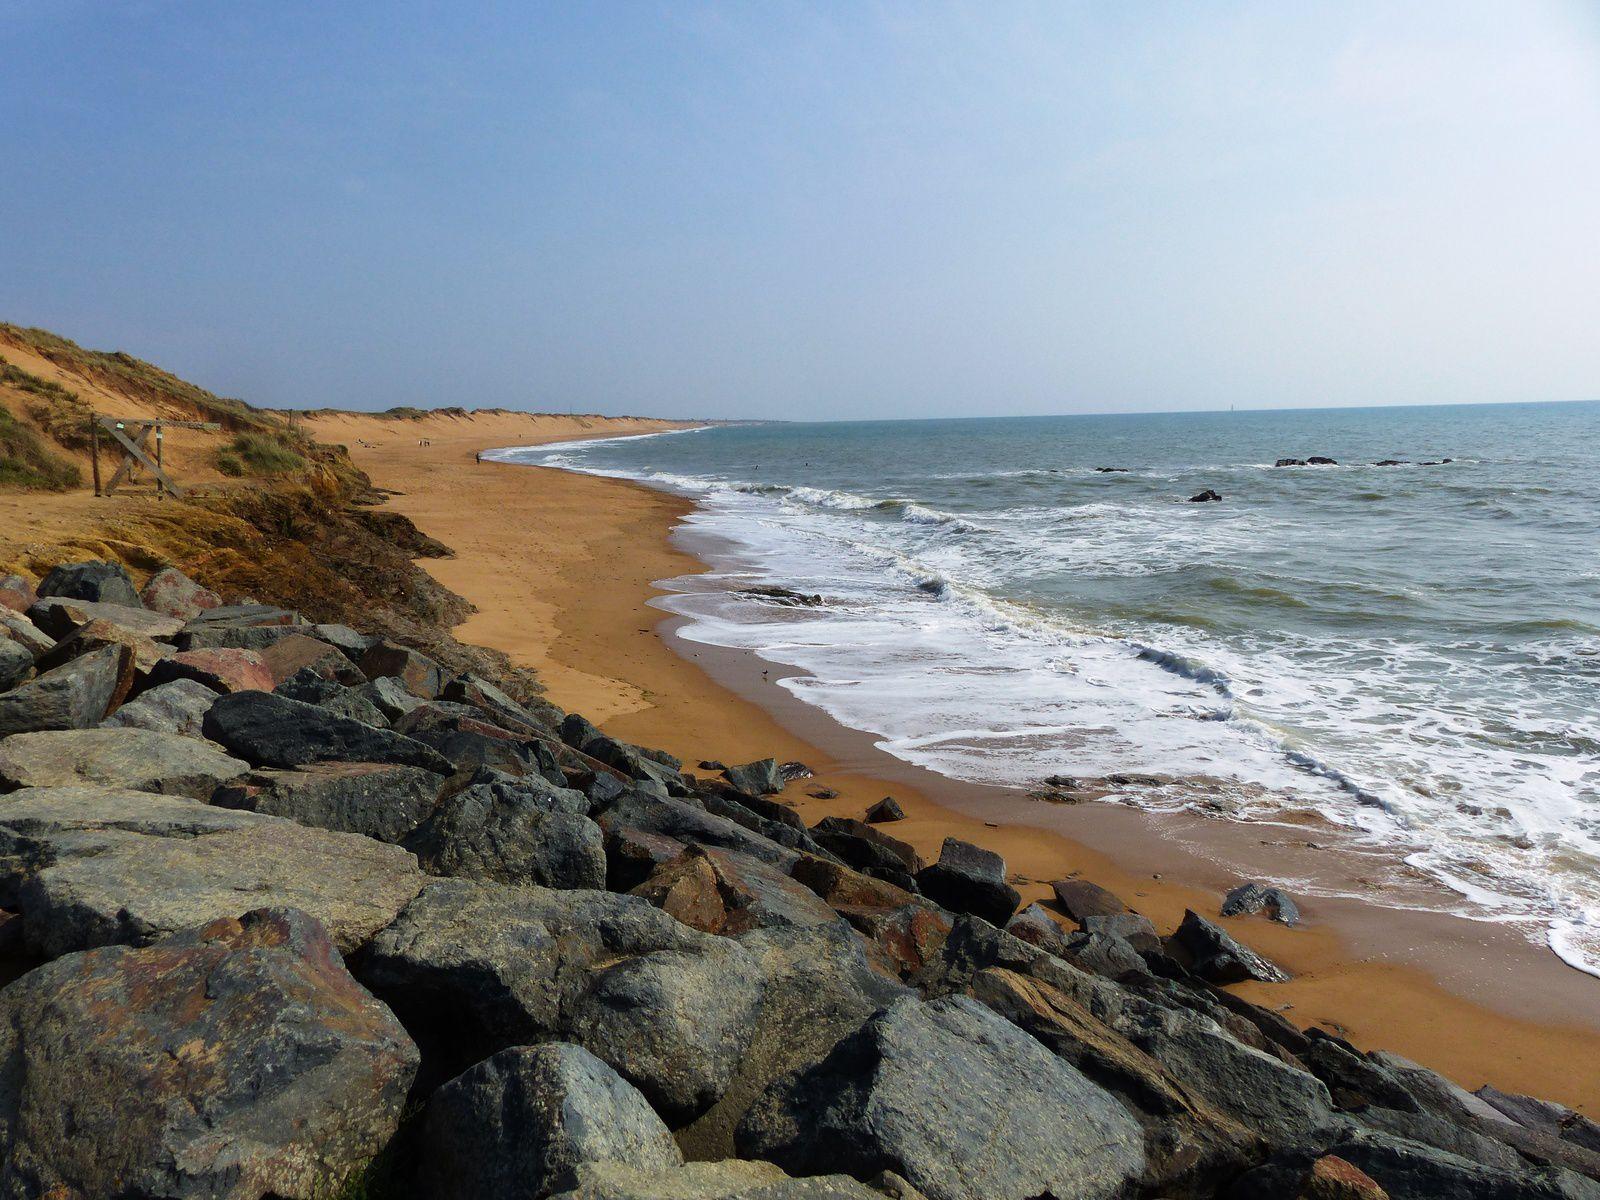 Promenade de mai à Olonne sur mer